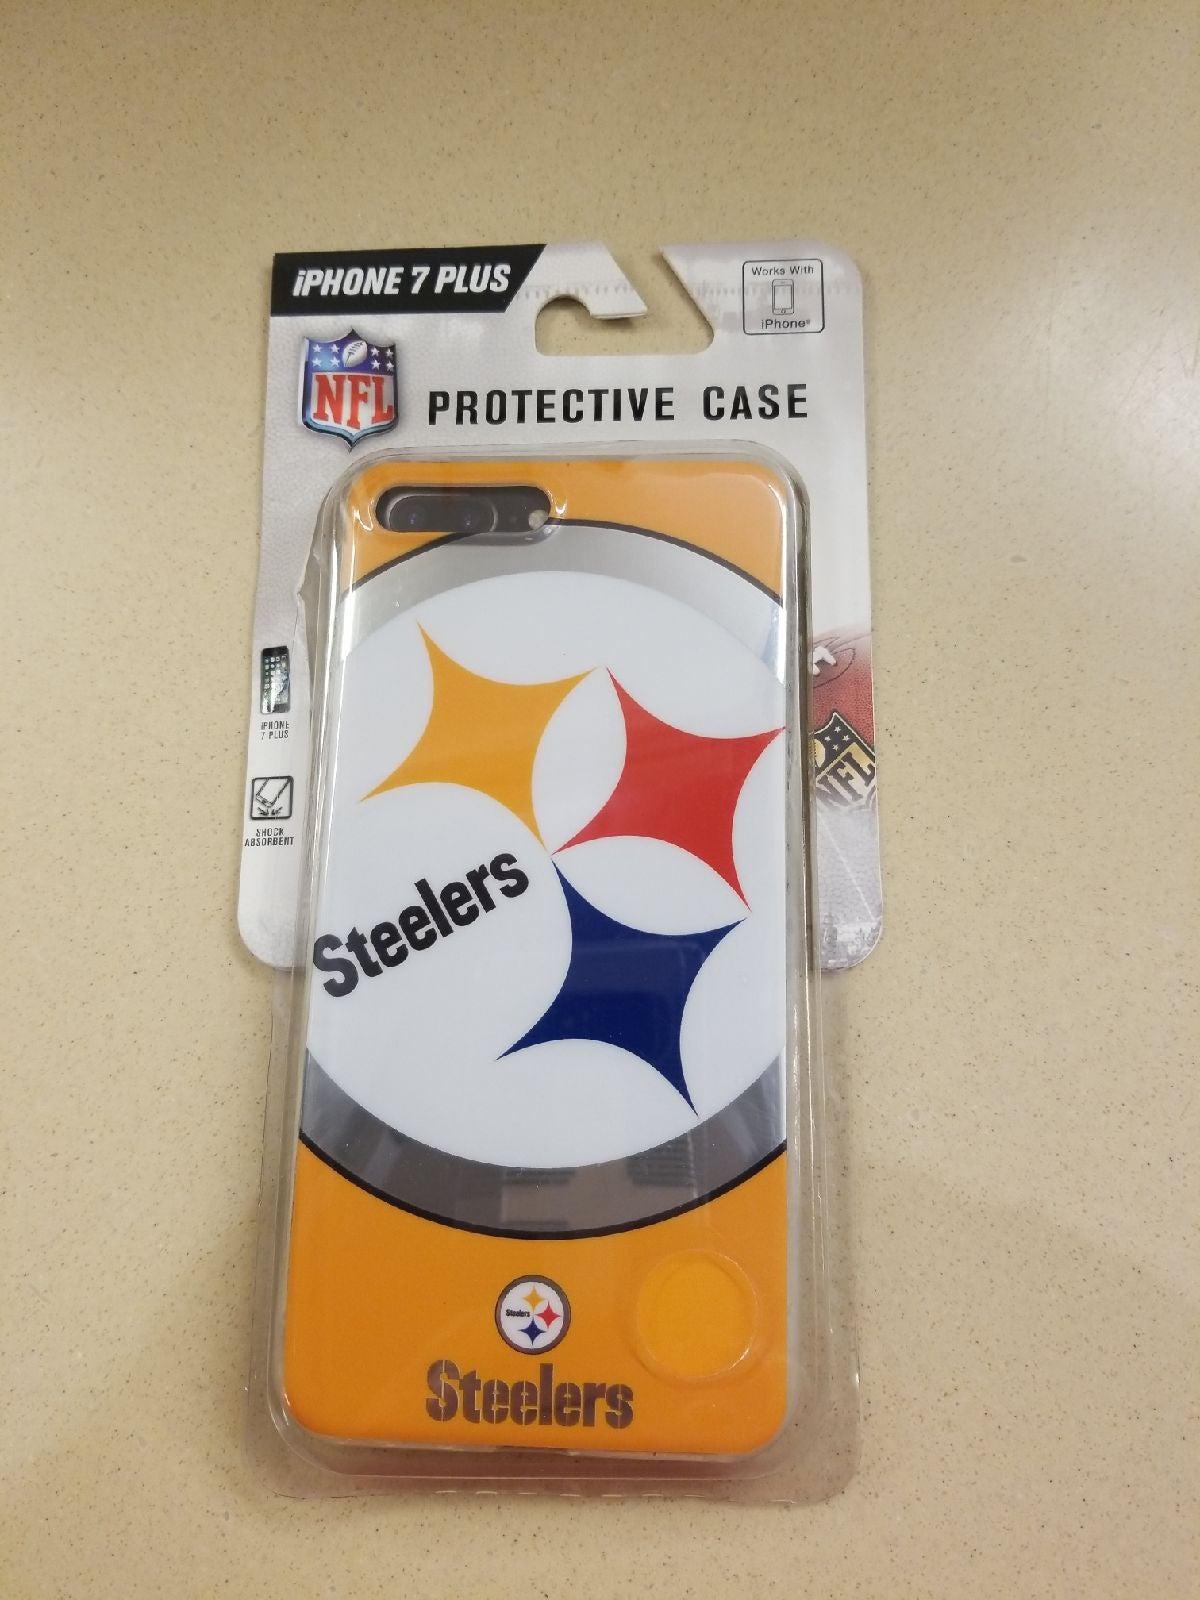 NFL iPhone 7 Plus Protective Case Steele